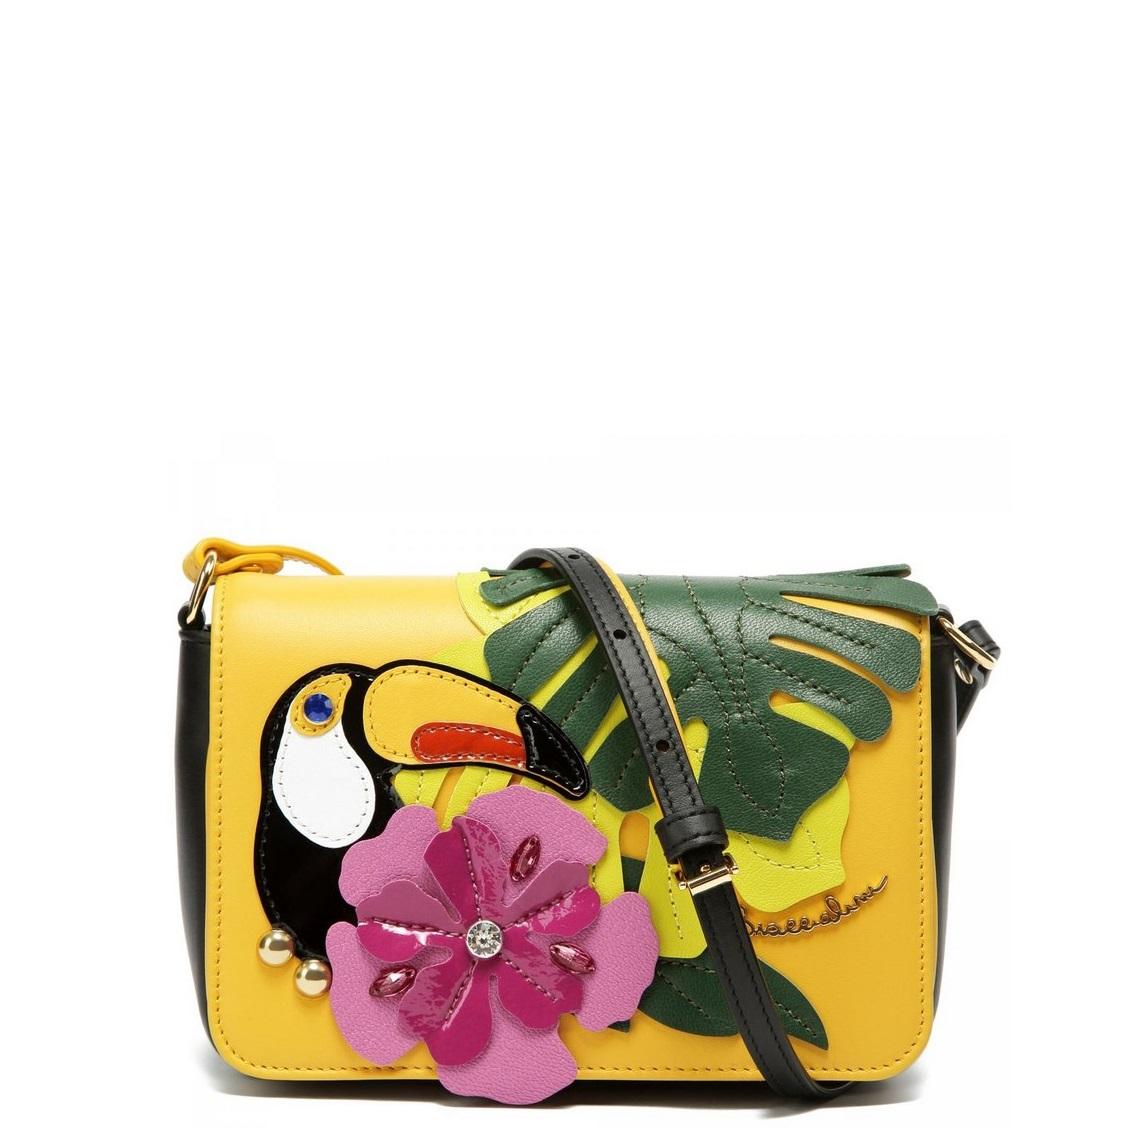 bce624ed5fcf Маленькая сумка Braccialini B12341 мультиколор - цена 14700 руб, купить